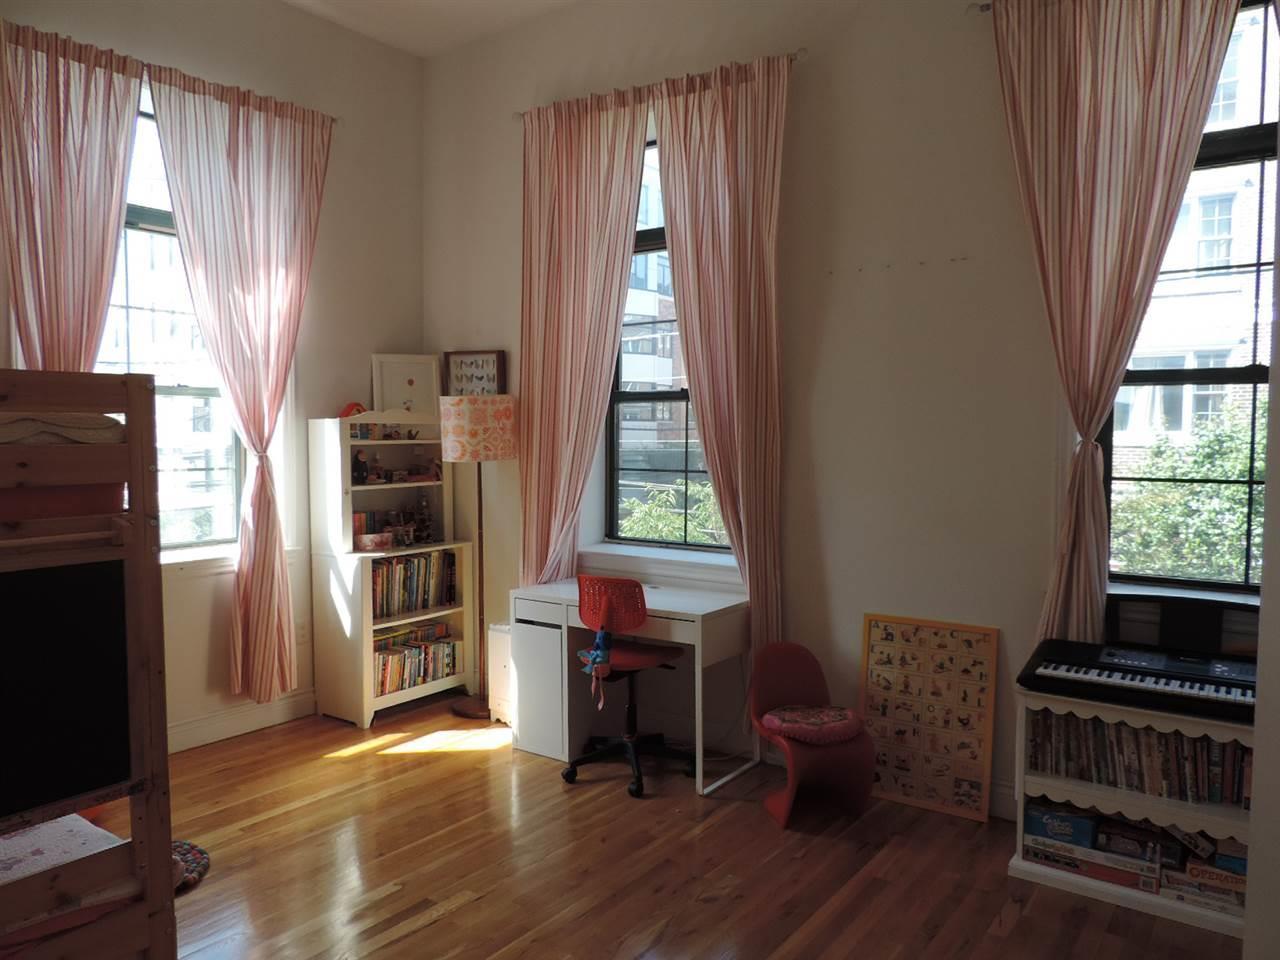 729 Madison St, Hoboken, NJ 07030